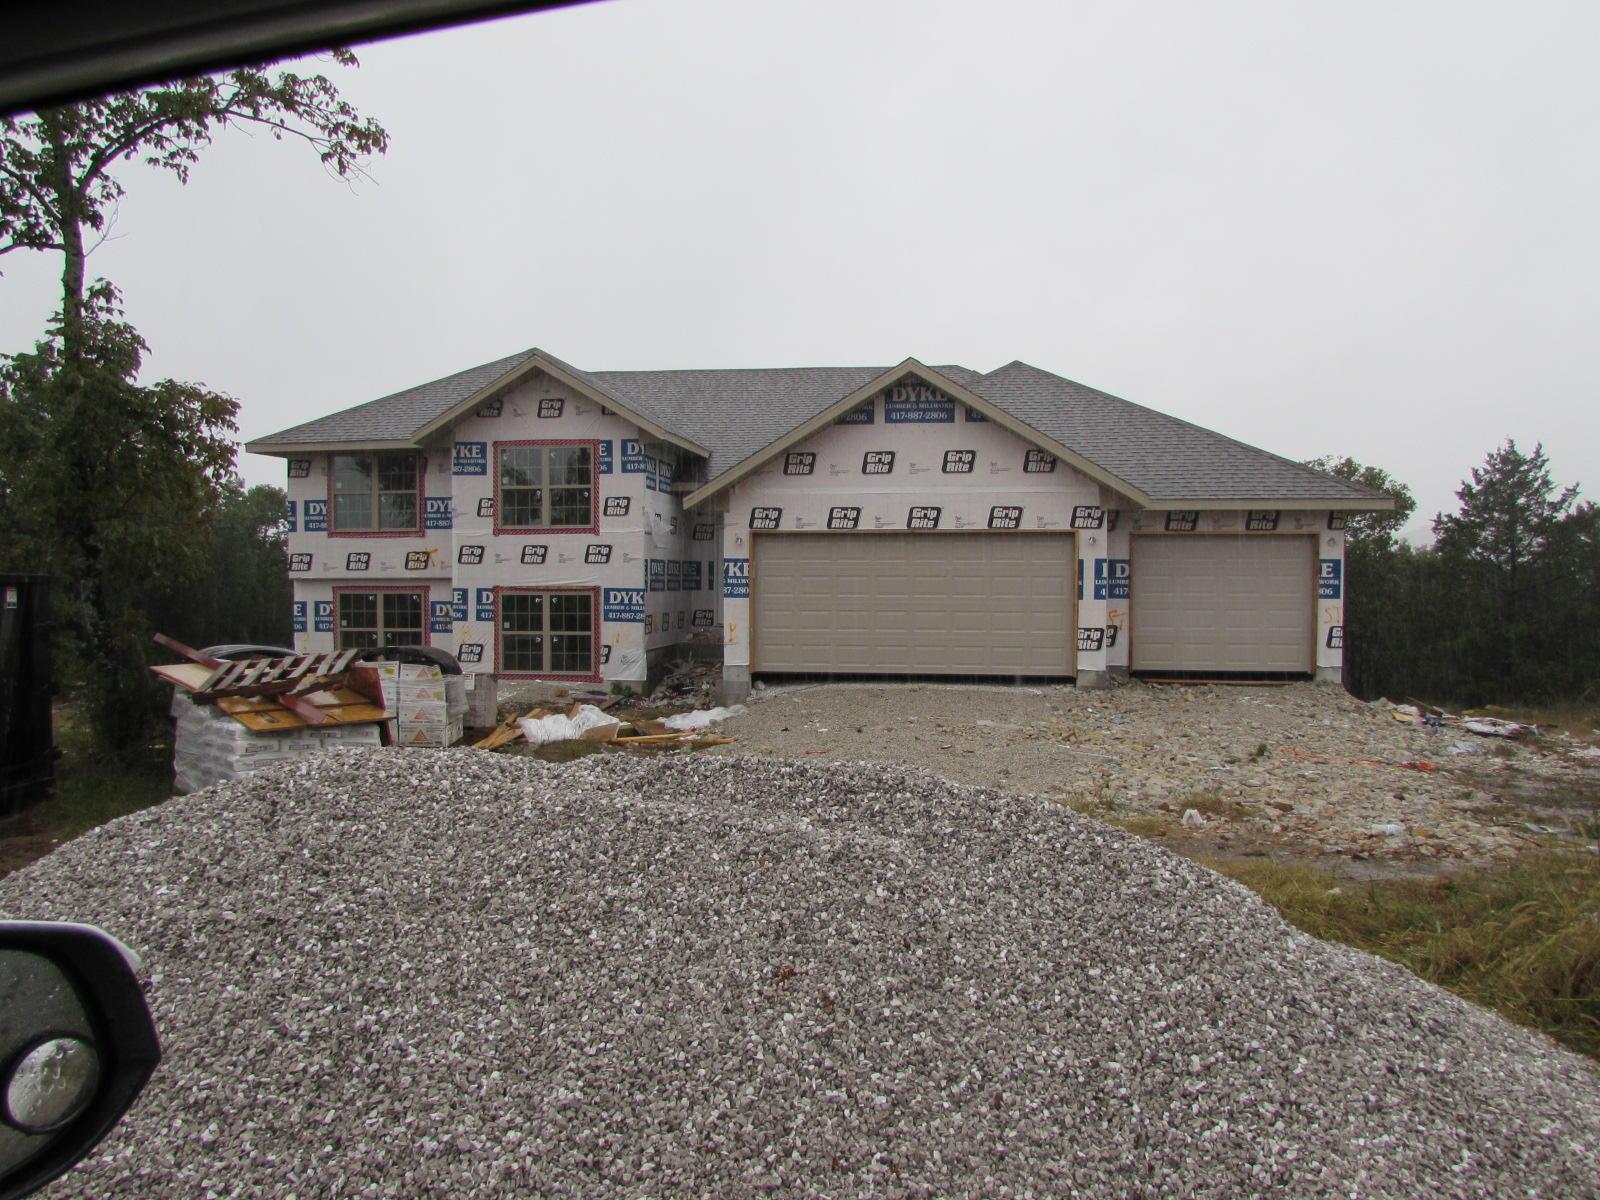 2176 Emory Creek Blvd Branson, MO 65616